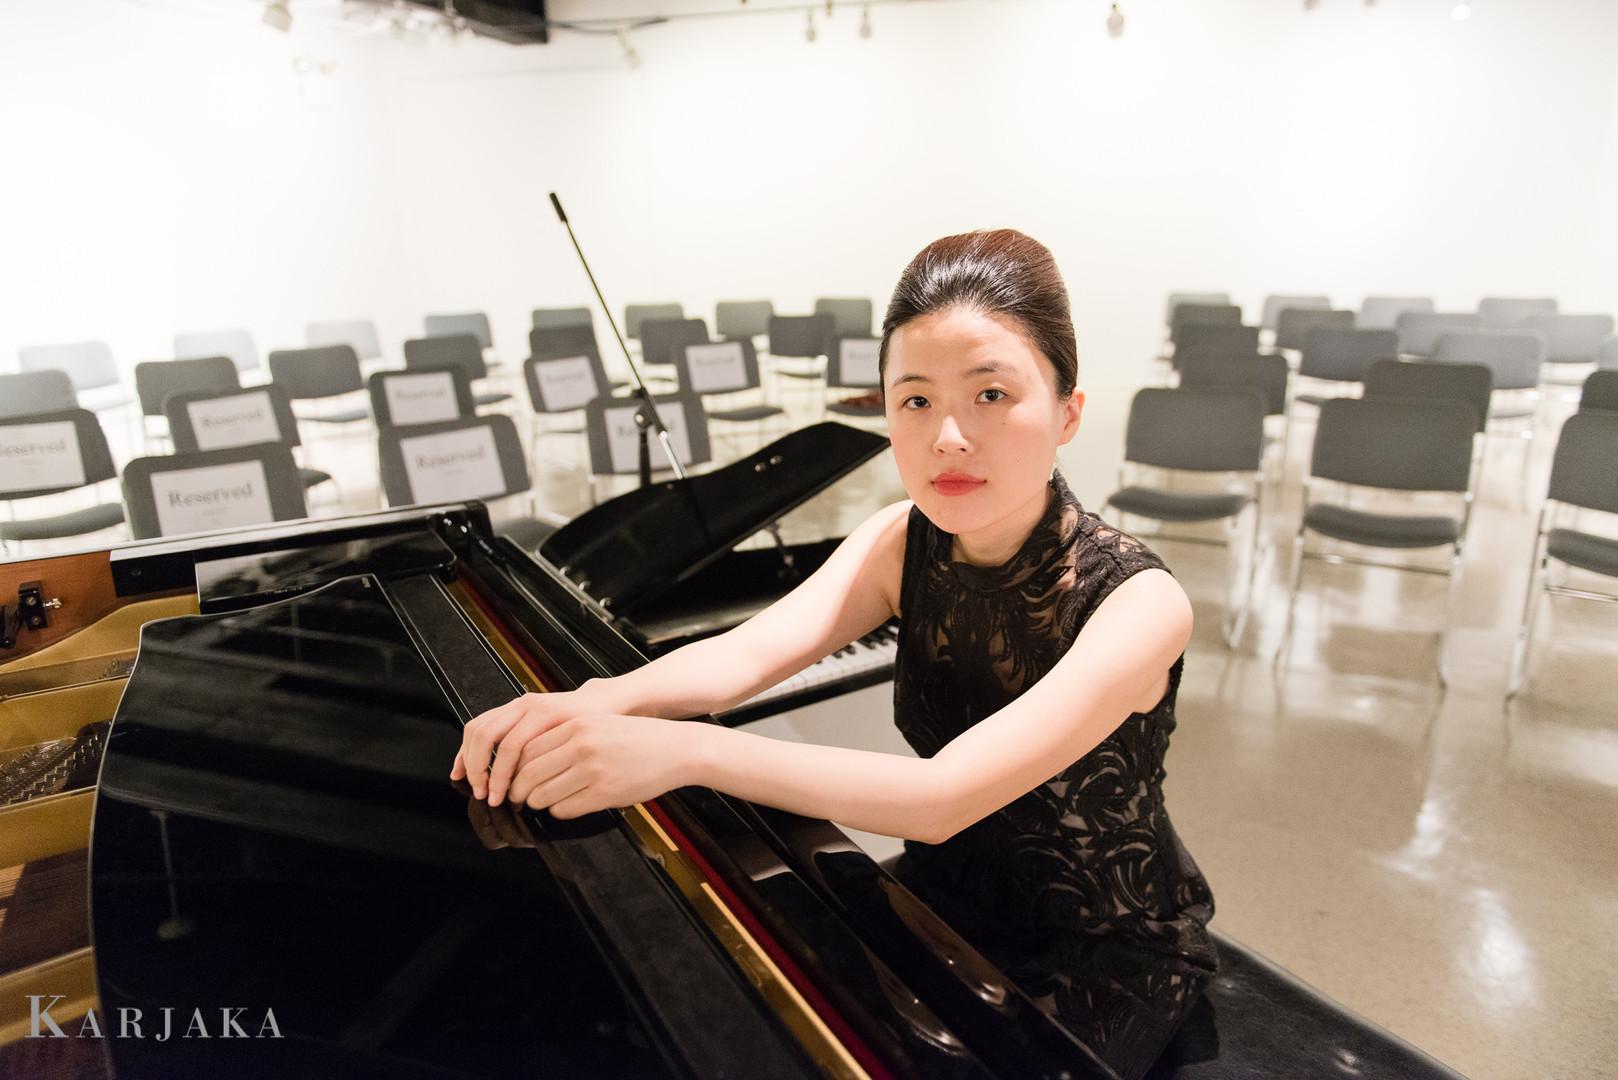 Eunbi Kim re: last night